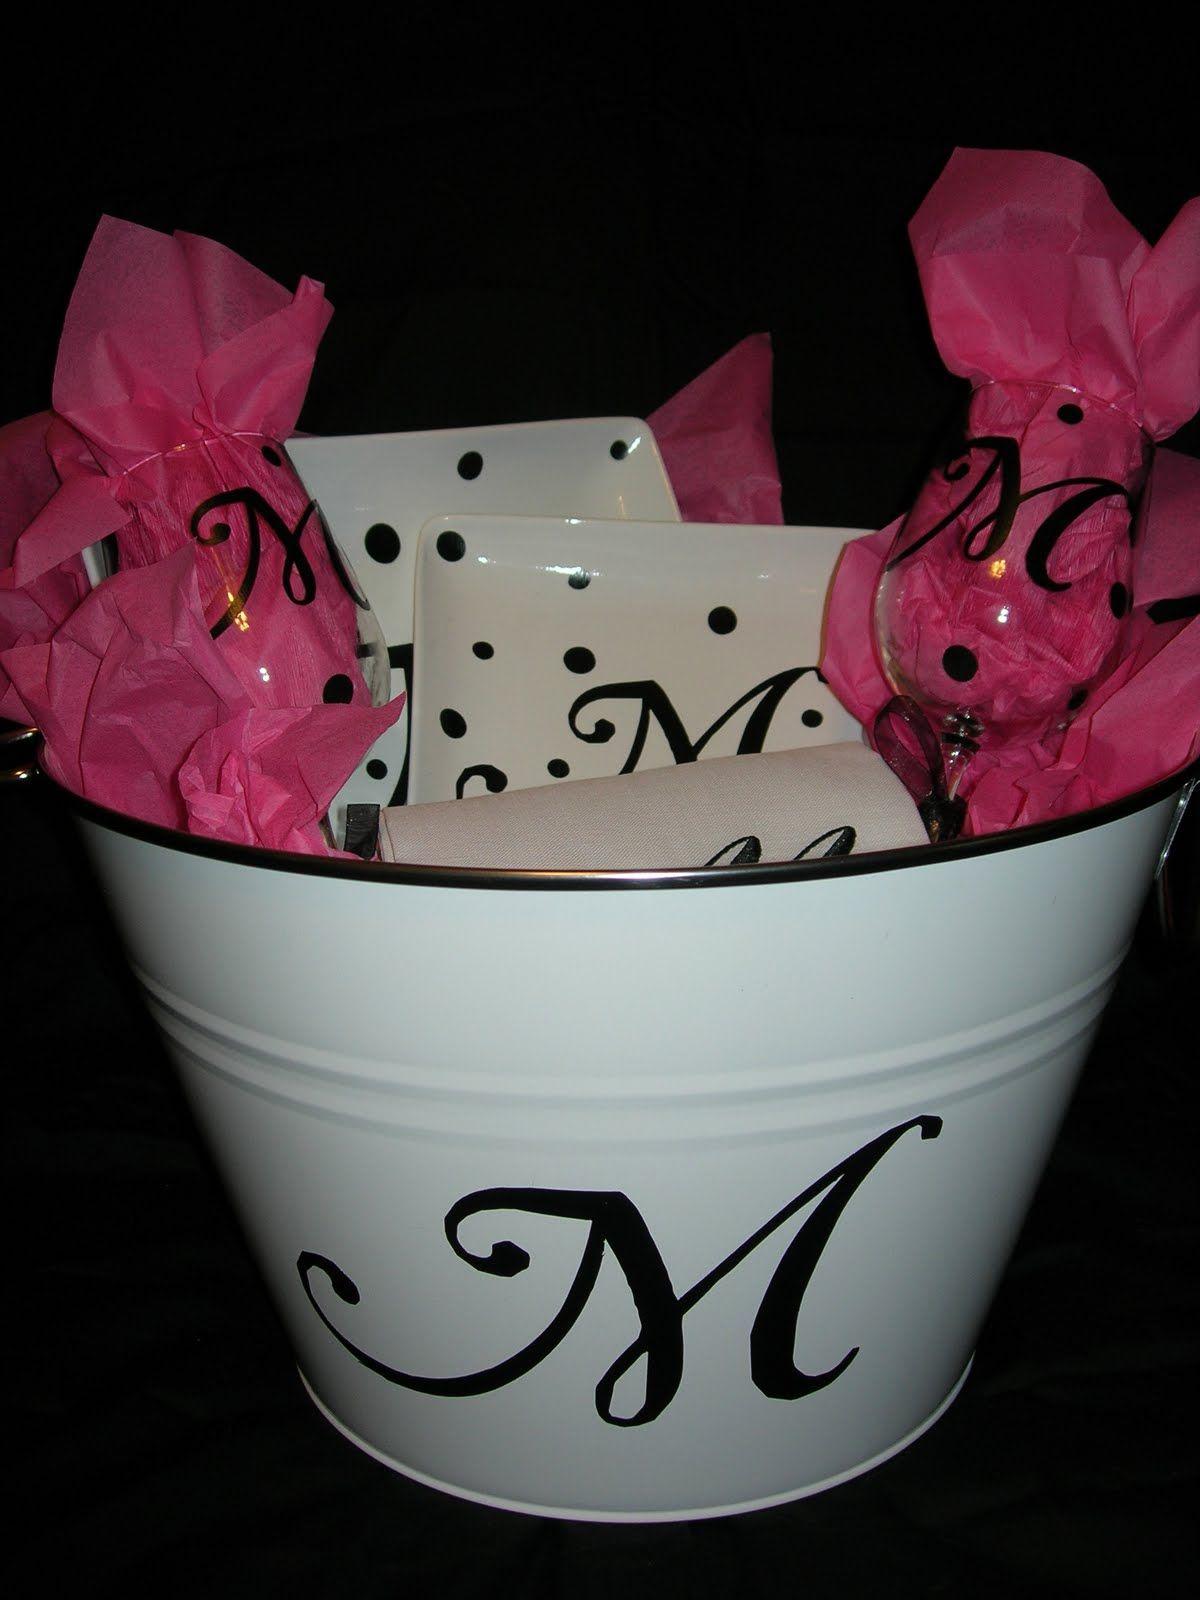 15+ Cricut craft ideas for weddings information